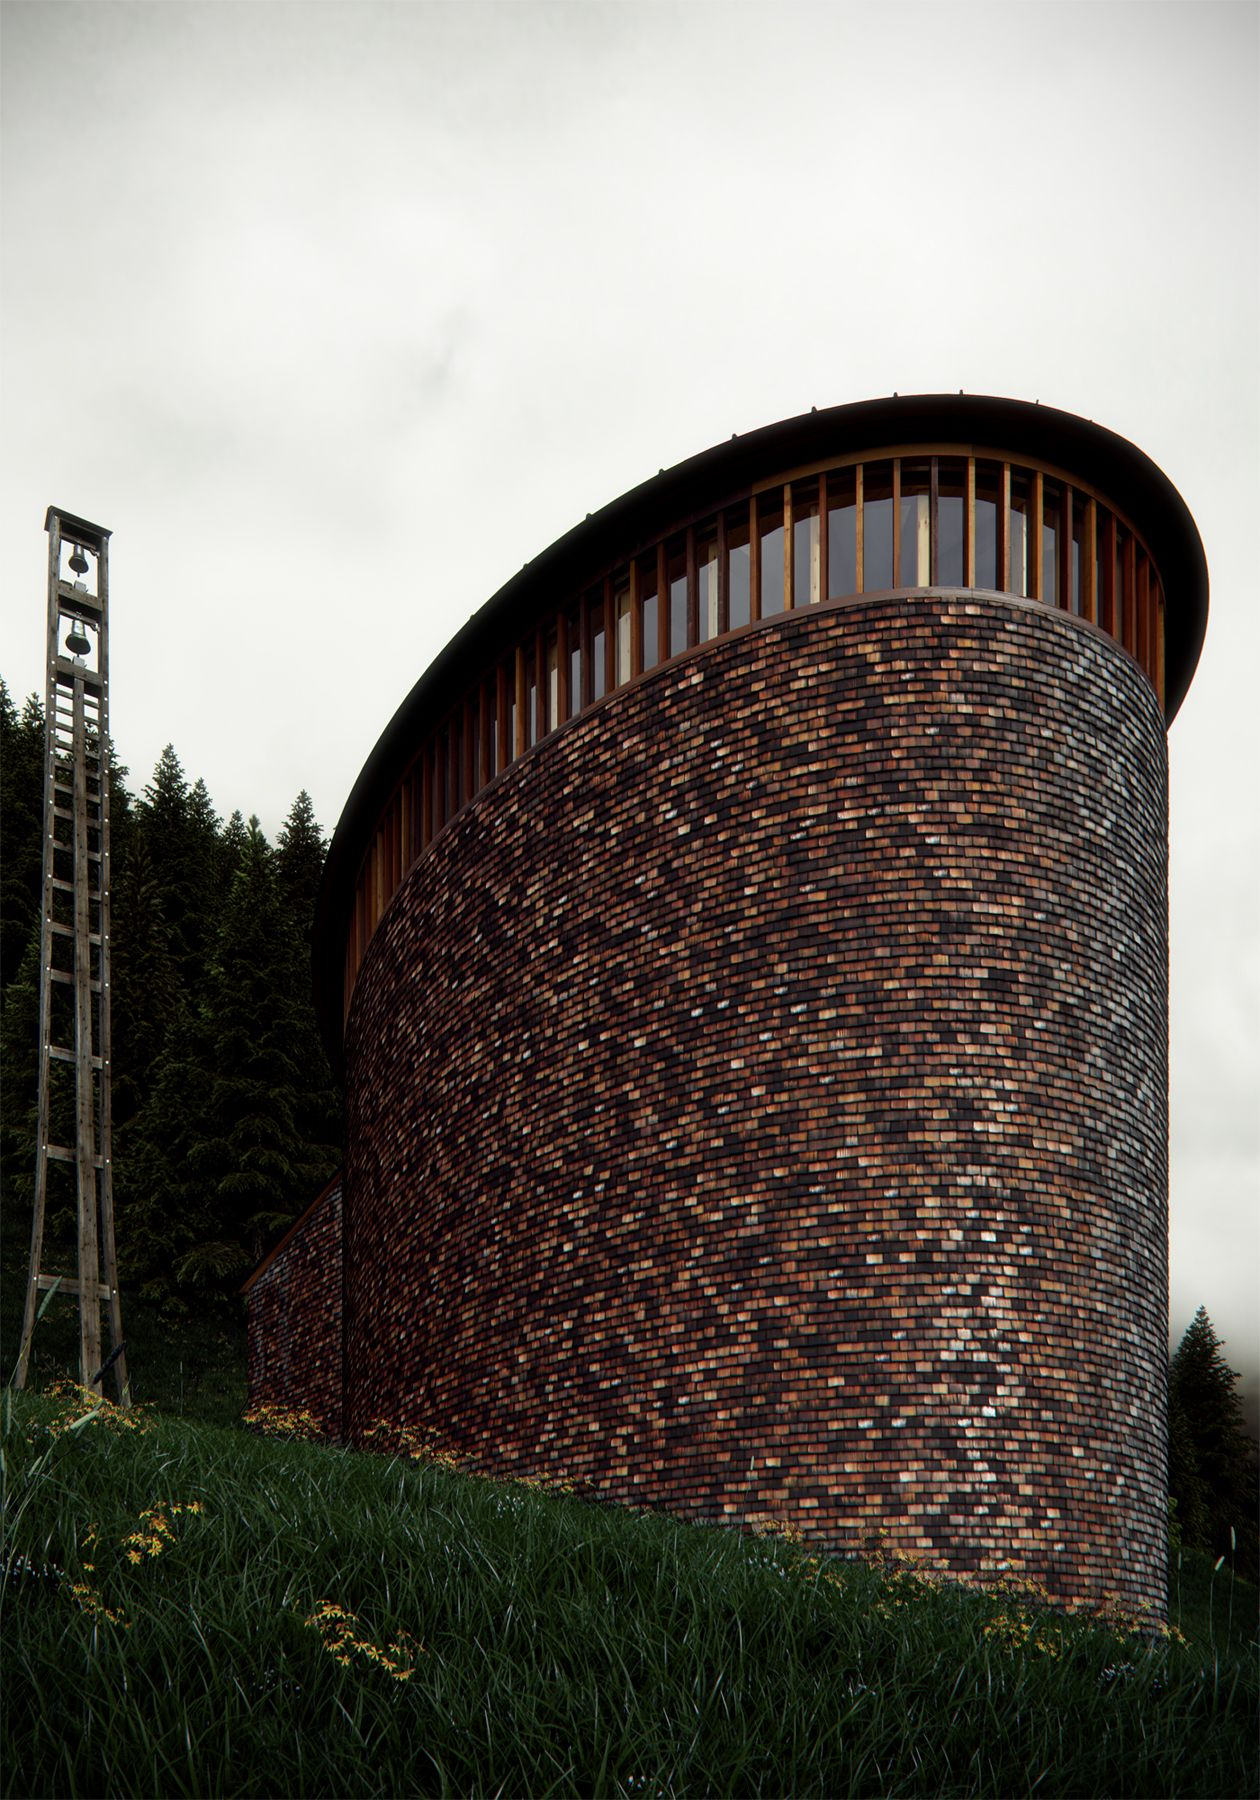 Caplutta Sogn Benedetg Ronen Bekerman 3D Architectural